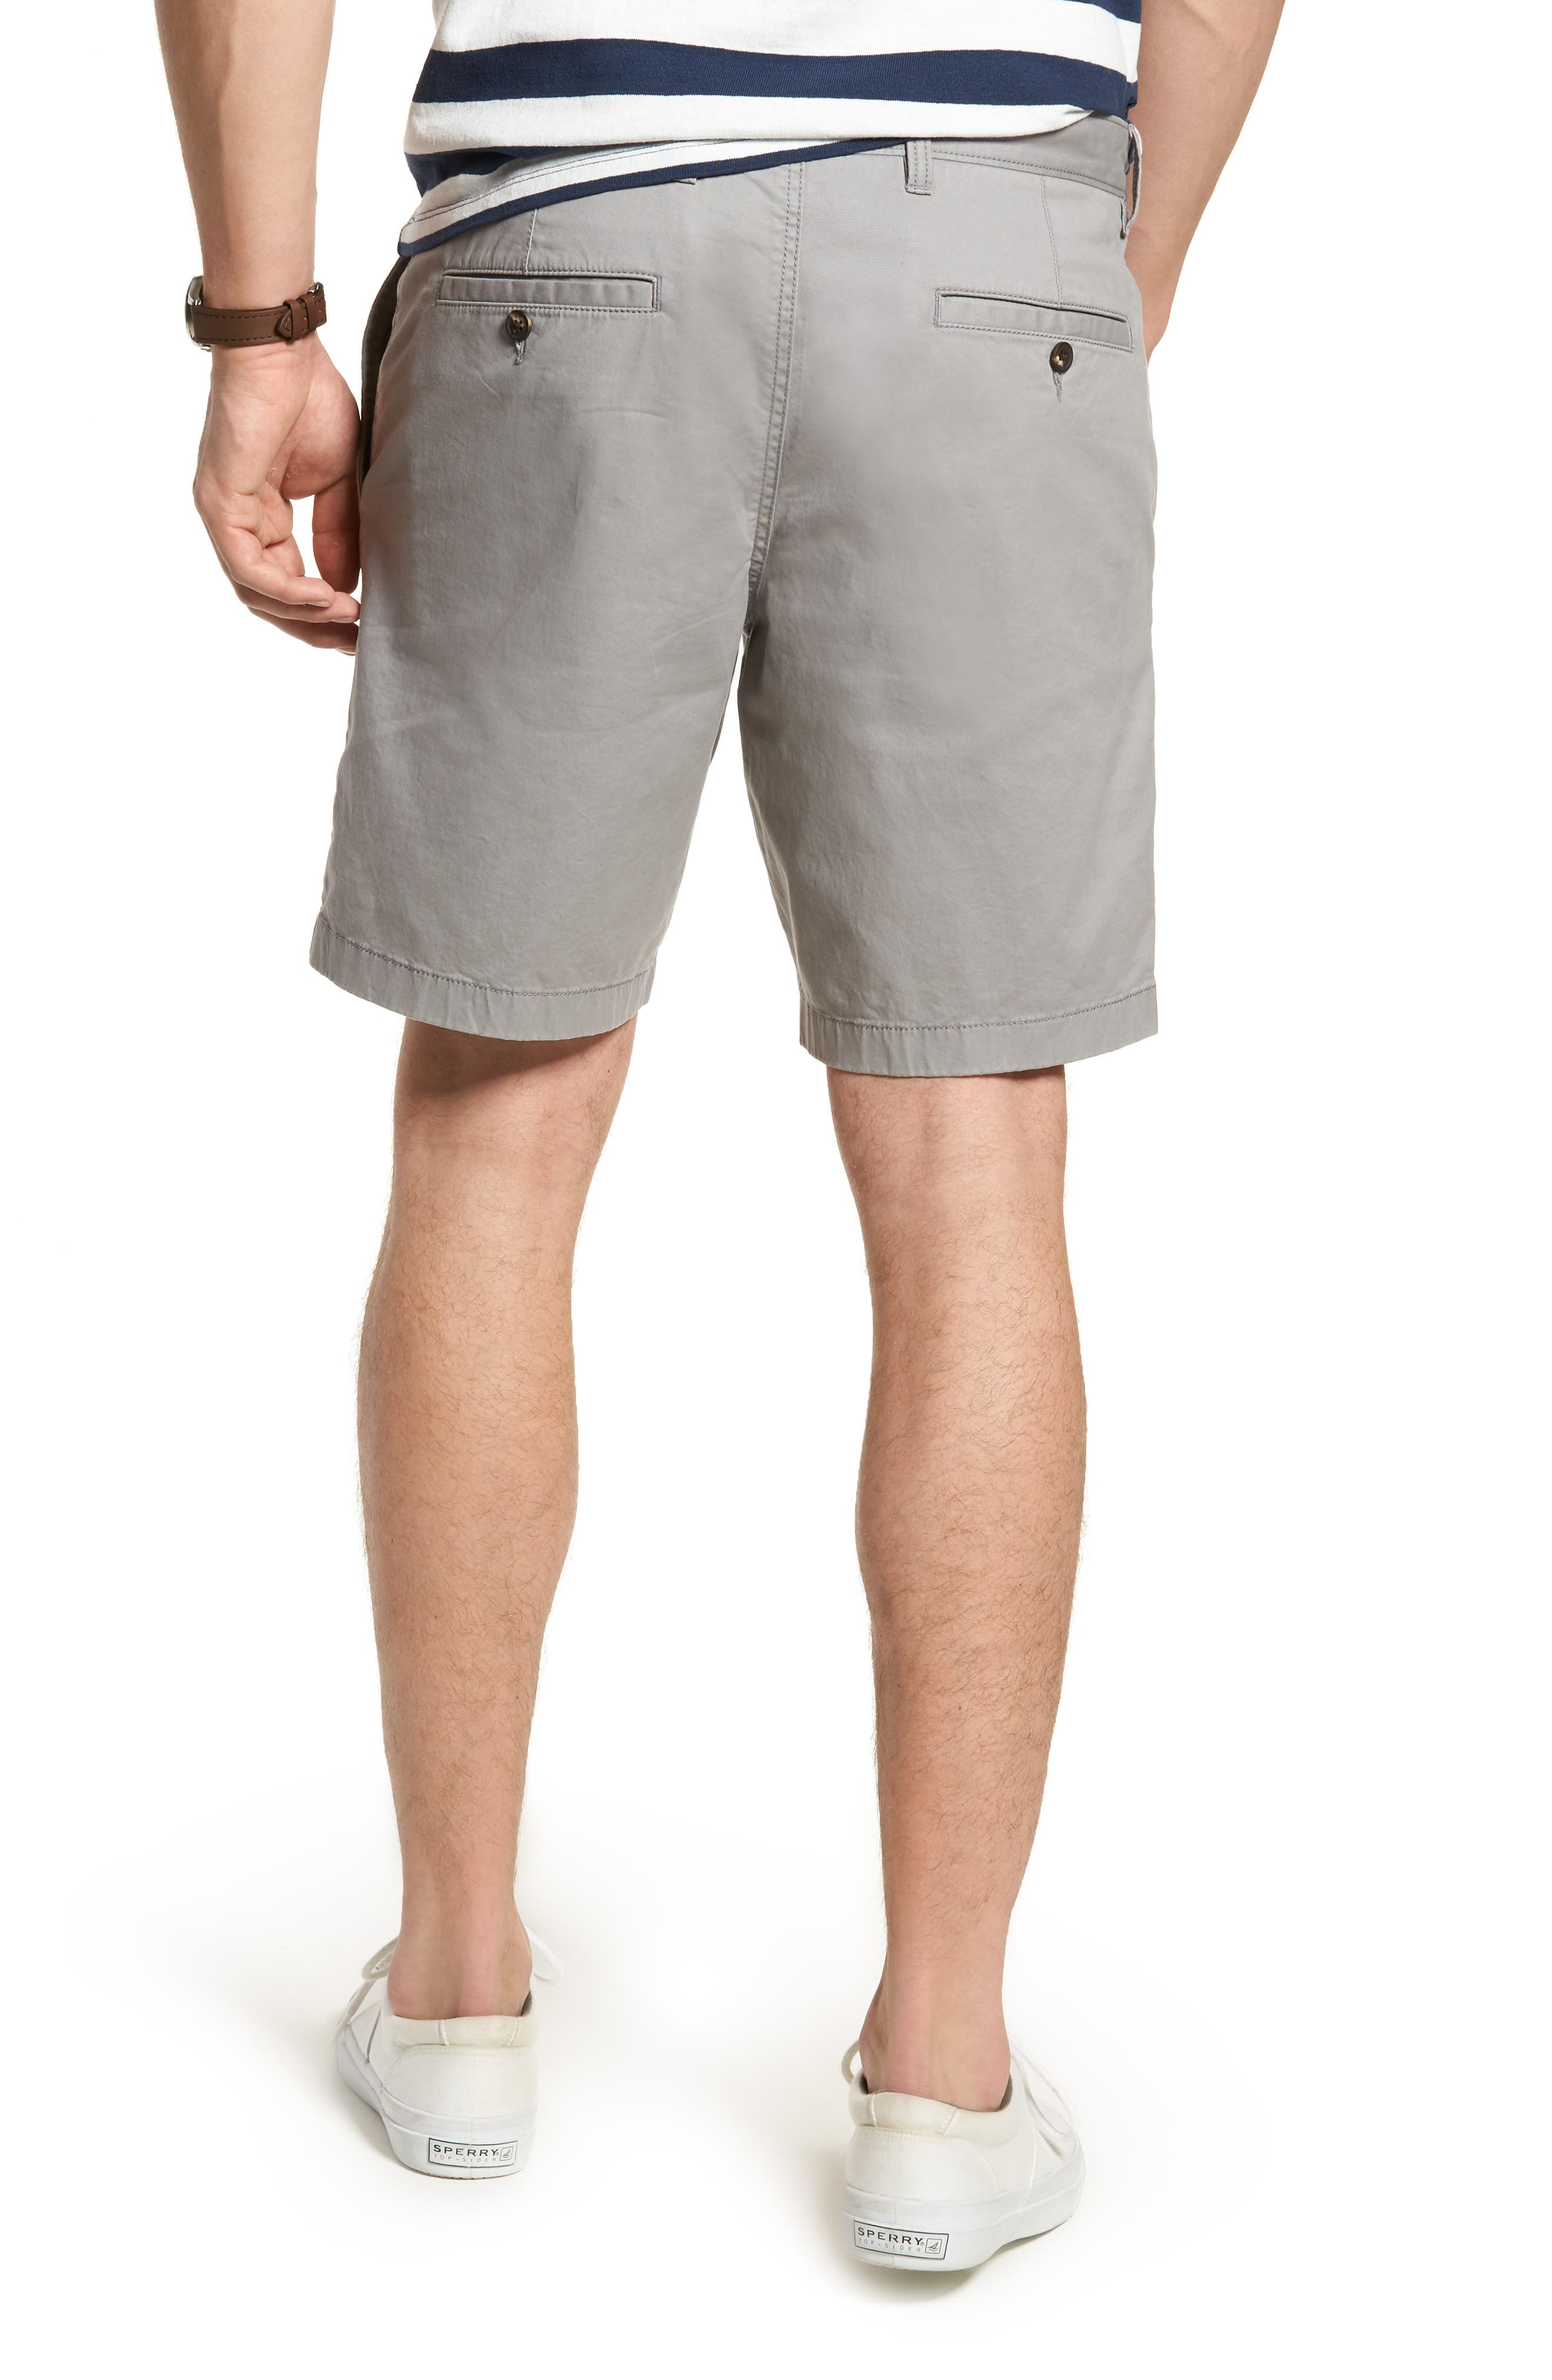 Ballard Slim Fit Stretch Chino 9-Inch Shorts,                             Alternate thumbnail 2, color,                             030